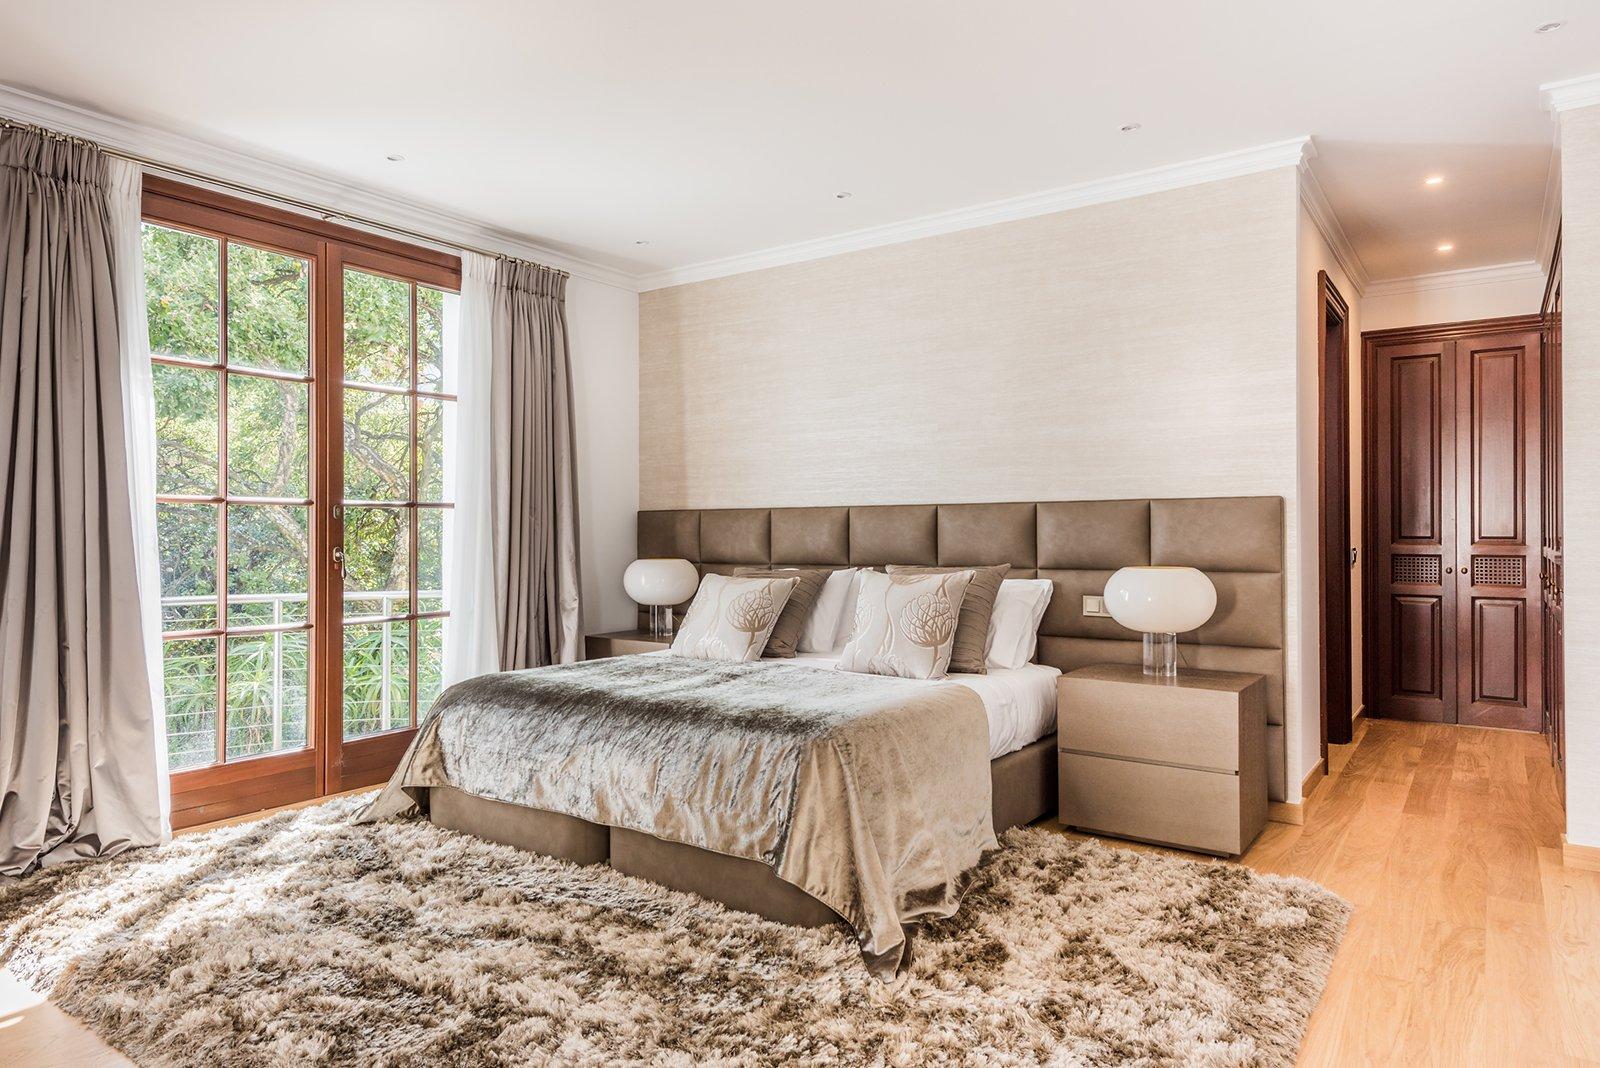 la-zagaleta-ambience-home-design-36